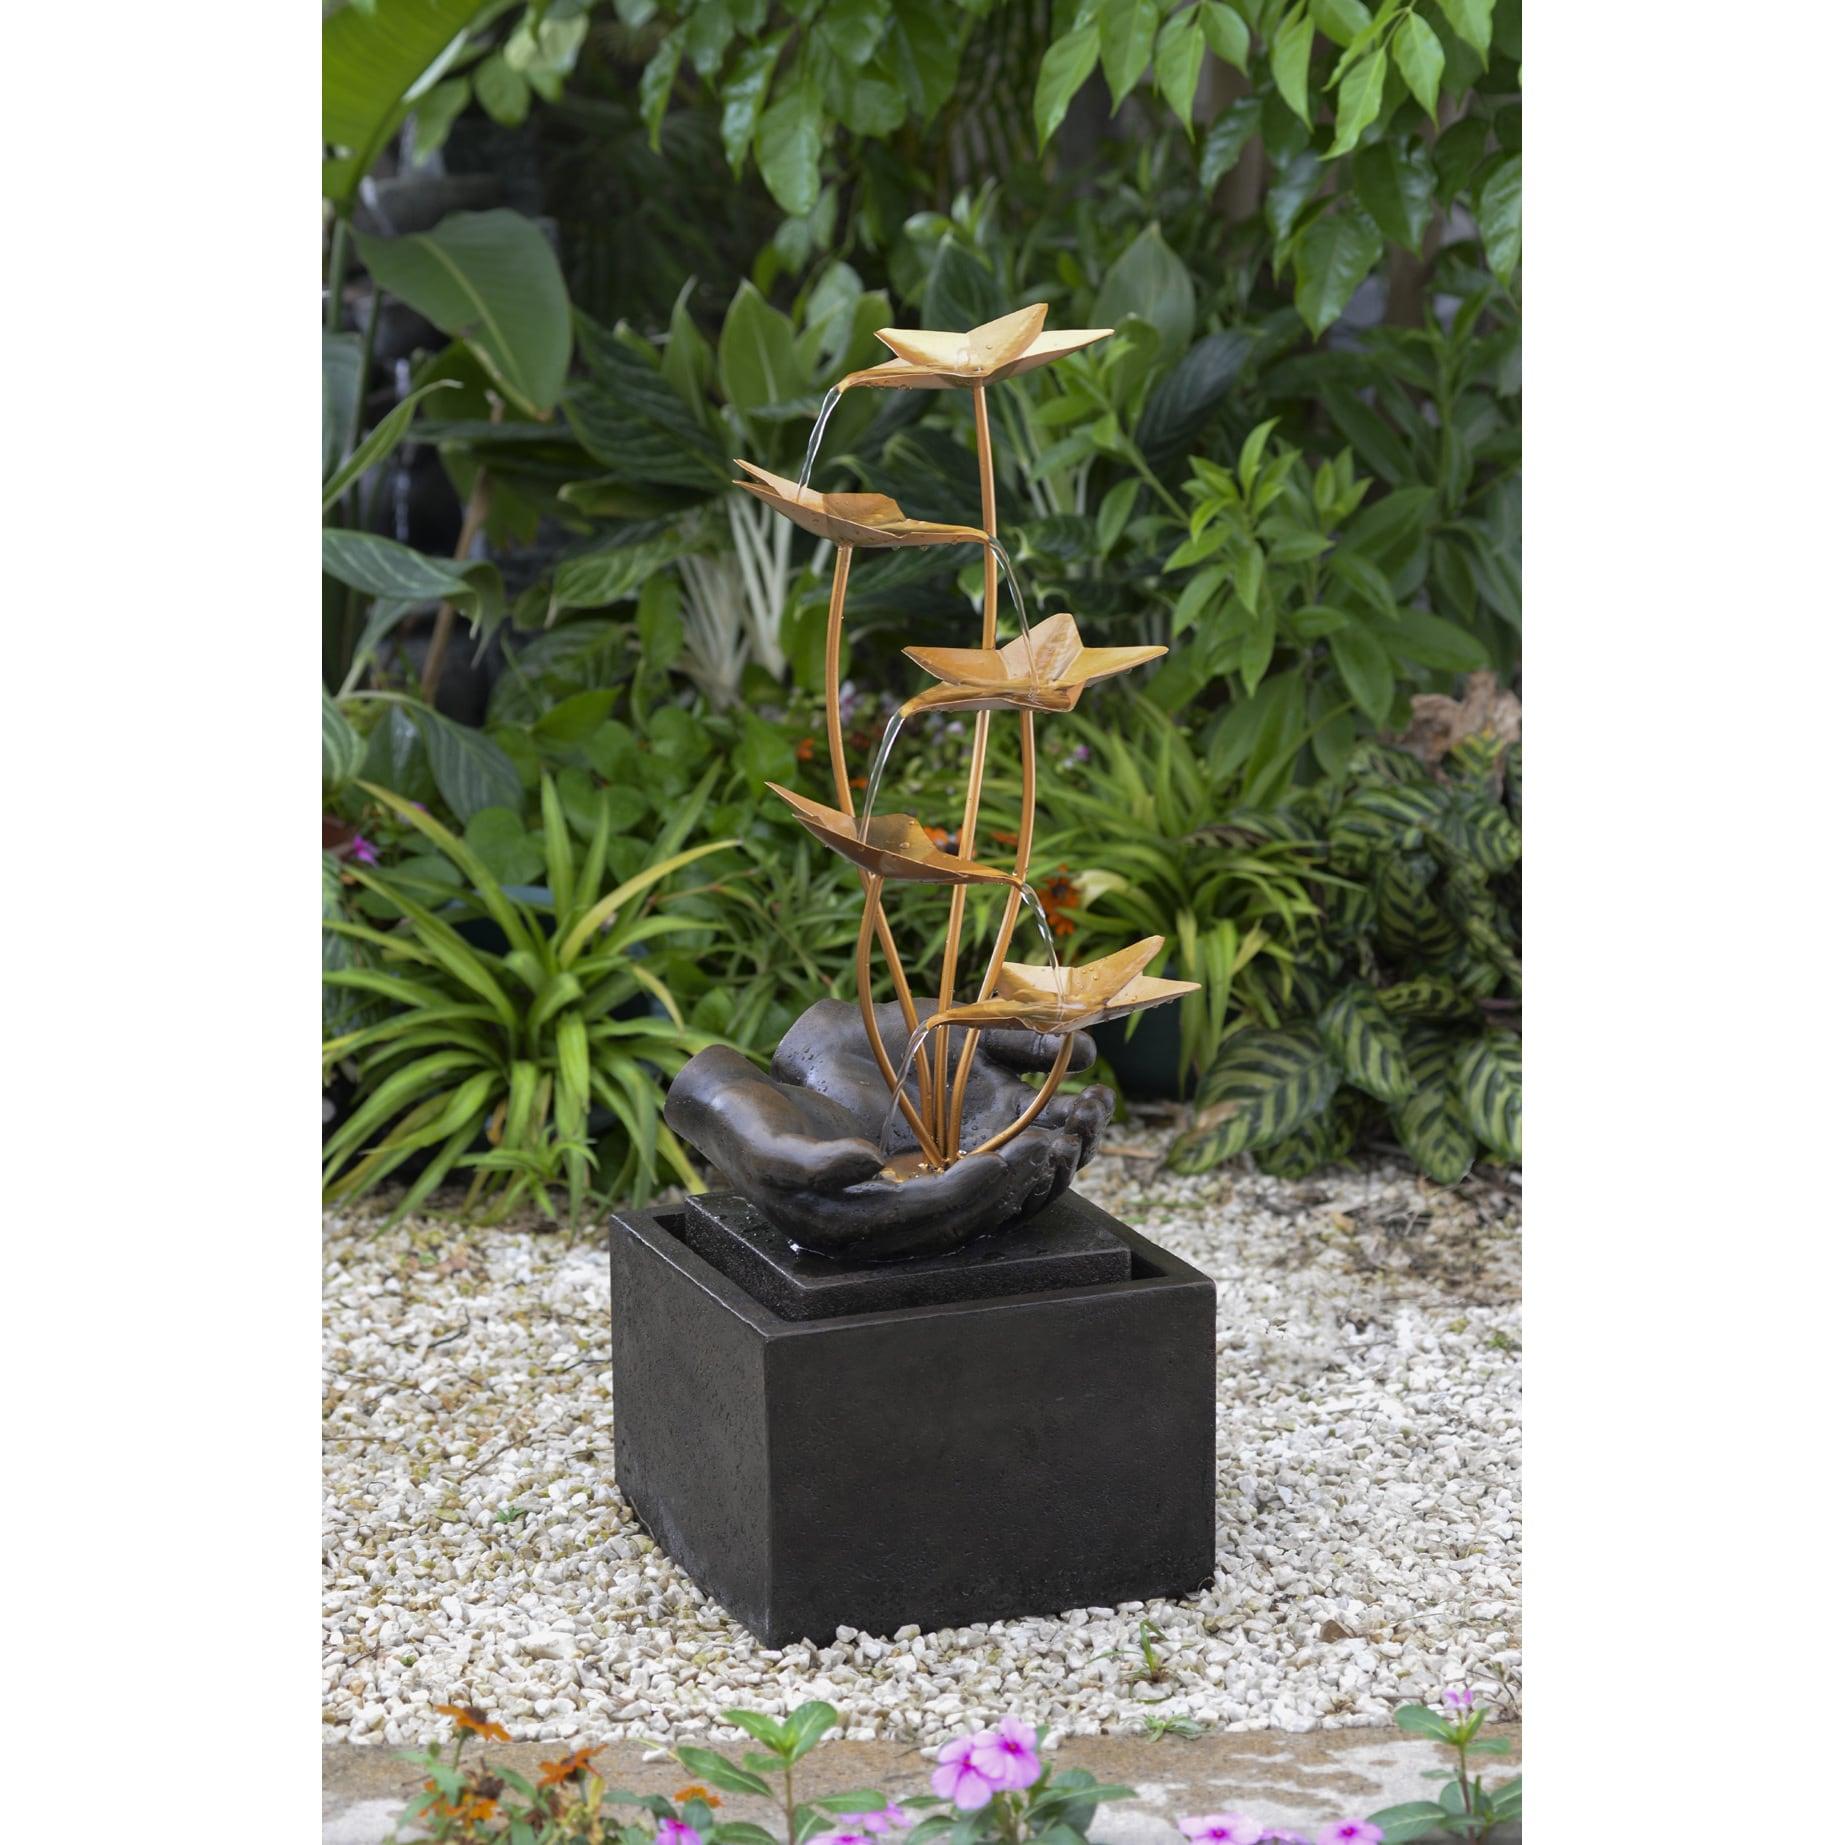 Buy Metal Outdoor Fountains Online At Overstock.com | Our Best Outdoor  Decor Deals